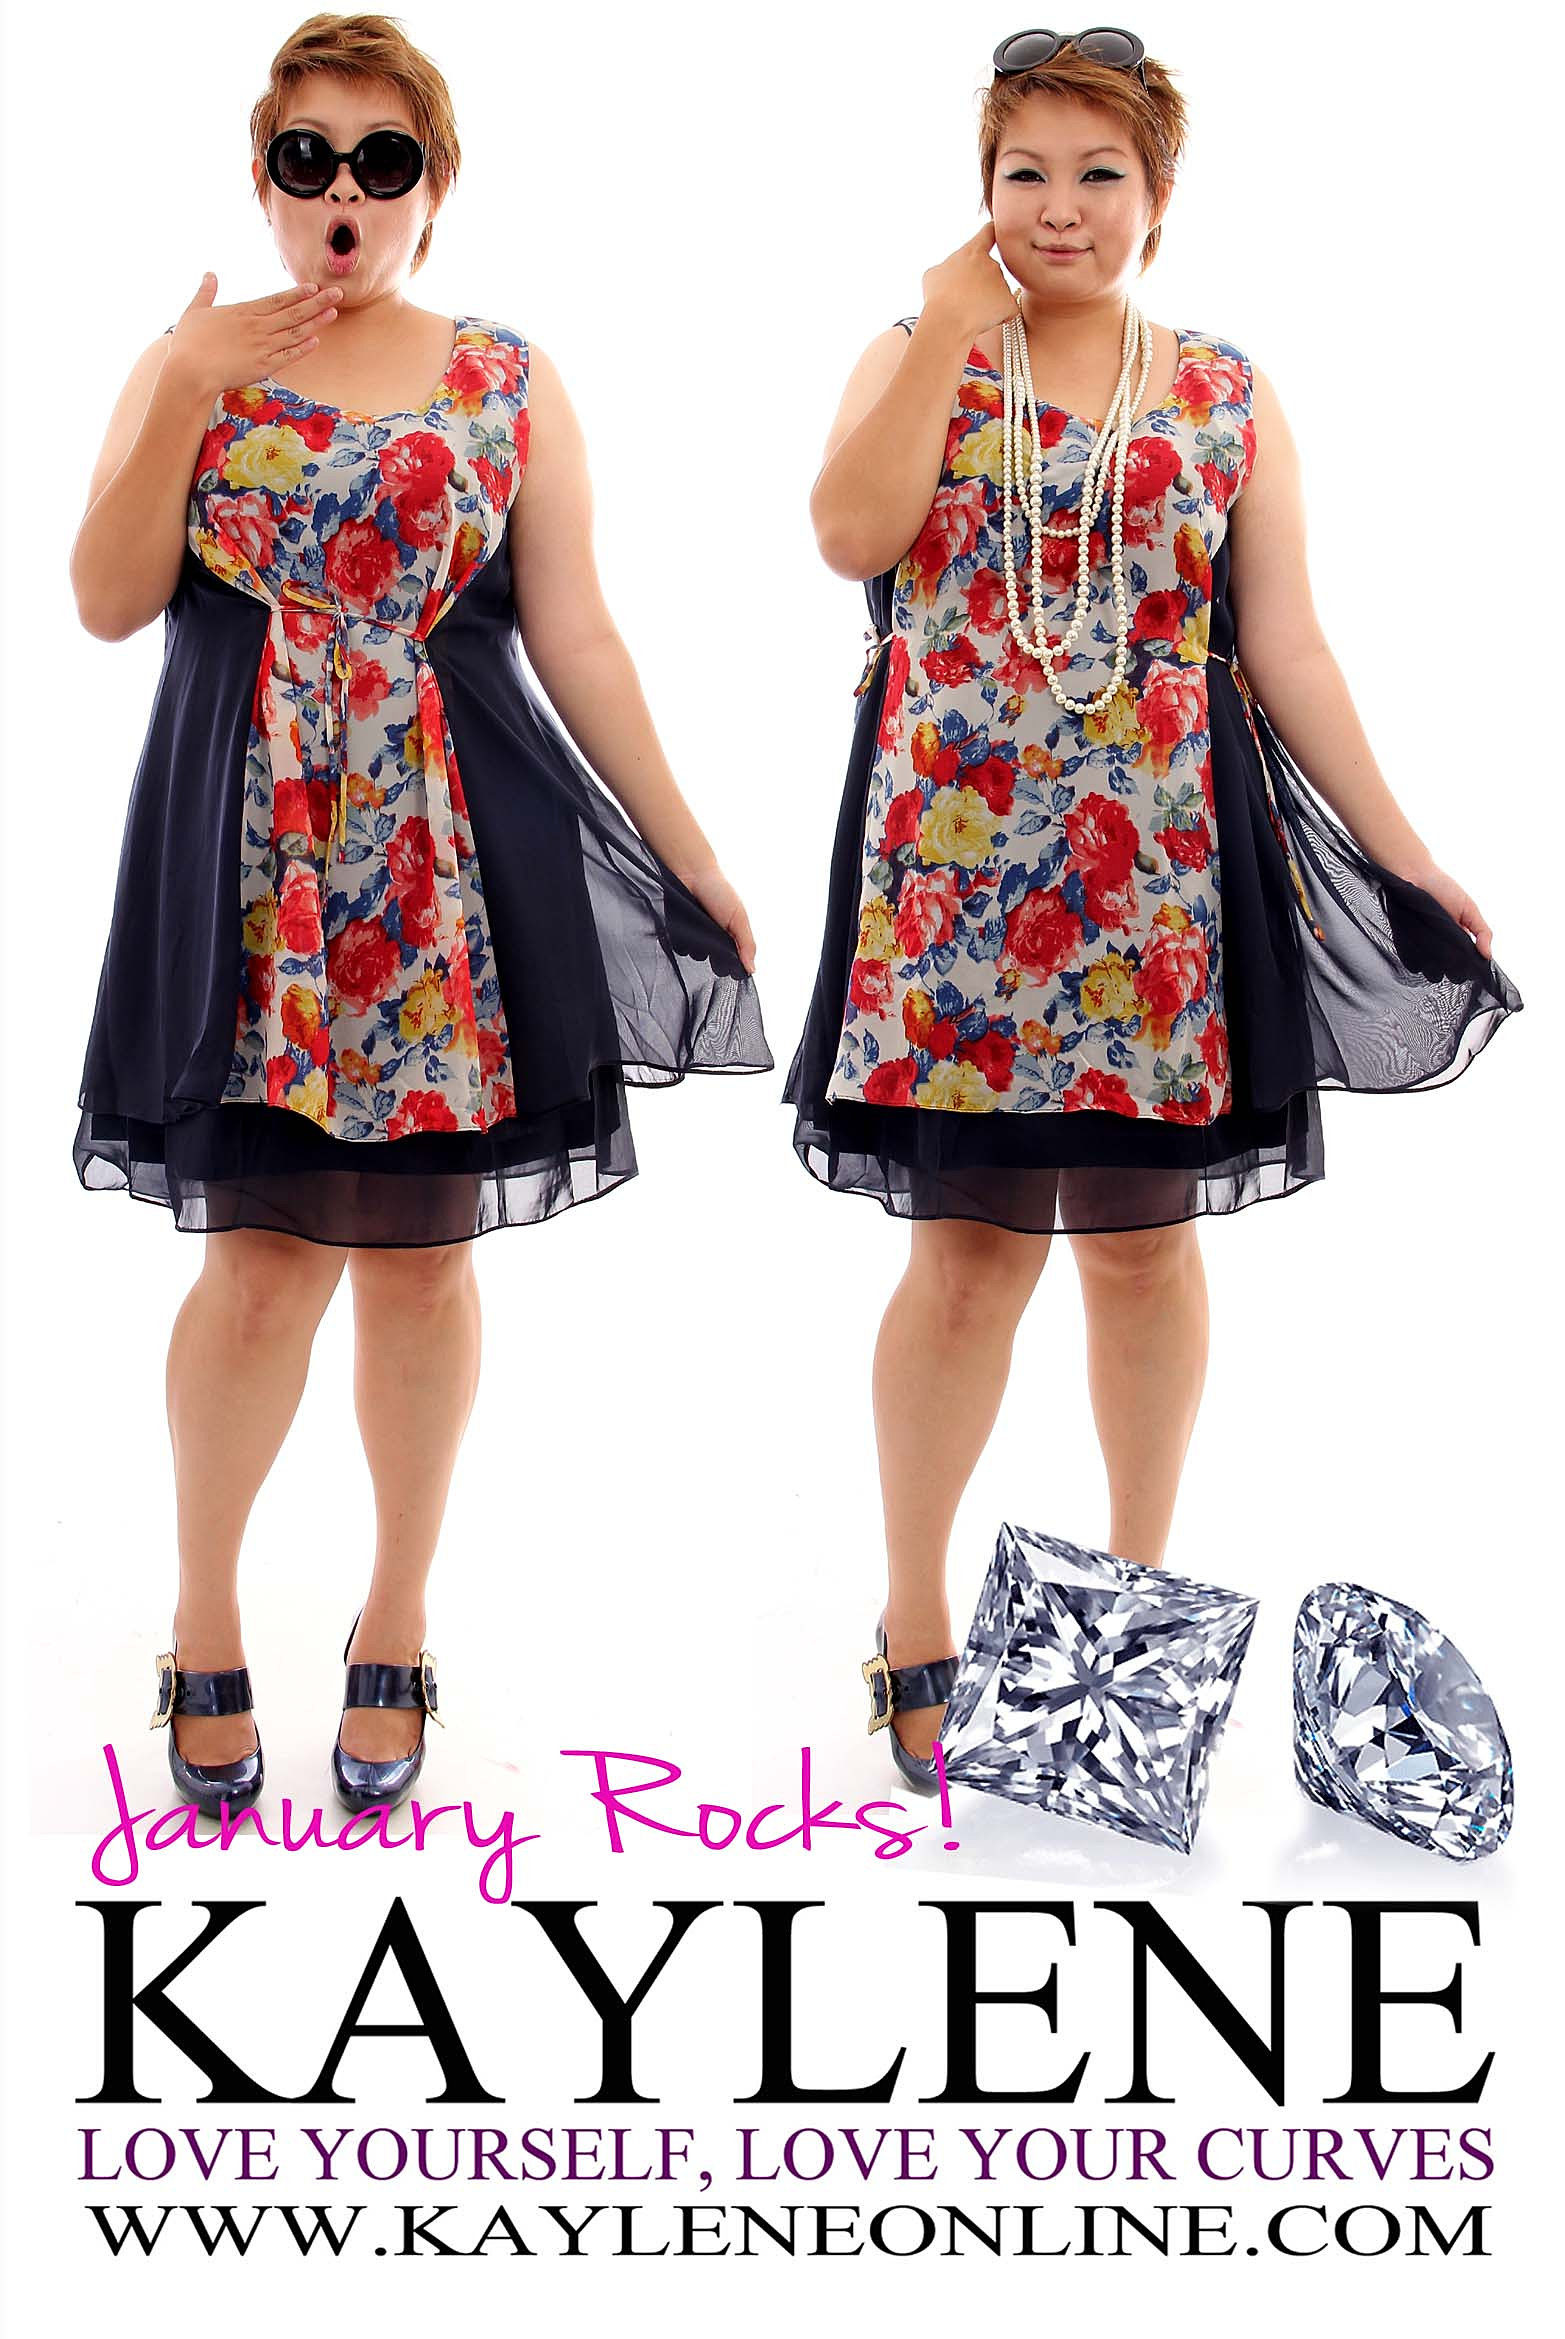 kaylene love yourself dress your curves plus size. Black Bedroom Furniture Sets. Home Design Ideas